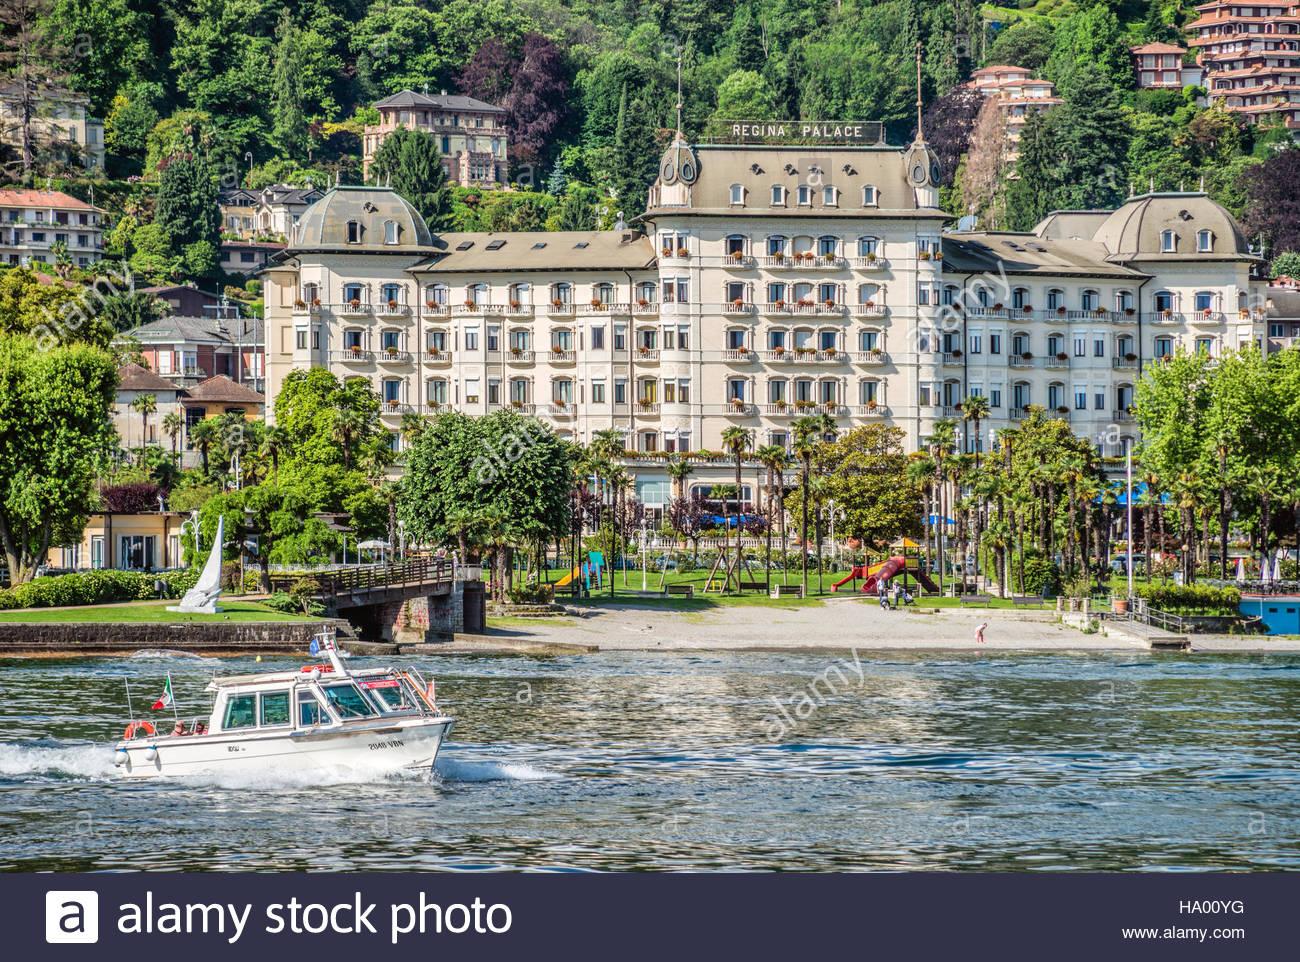 Regina palace hotel at the waterfront of stresa at lago for Designhotel lago maggiore